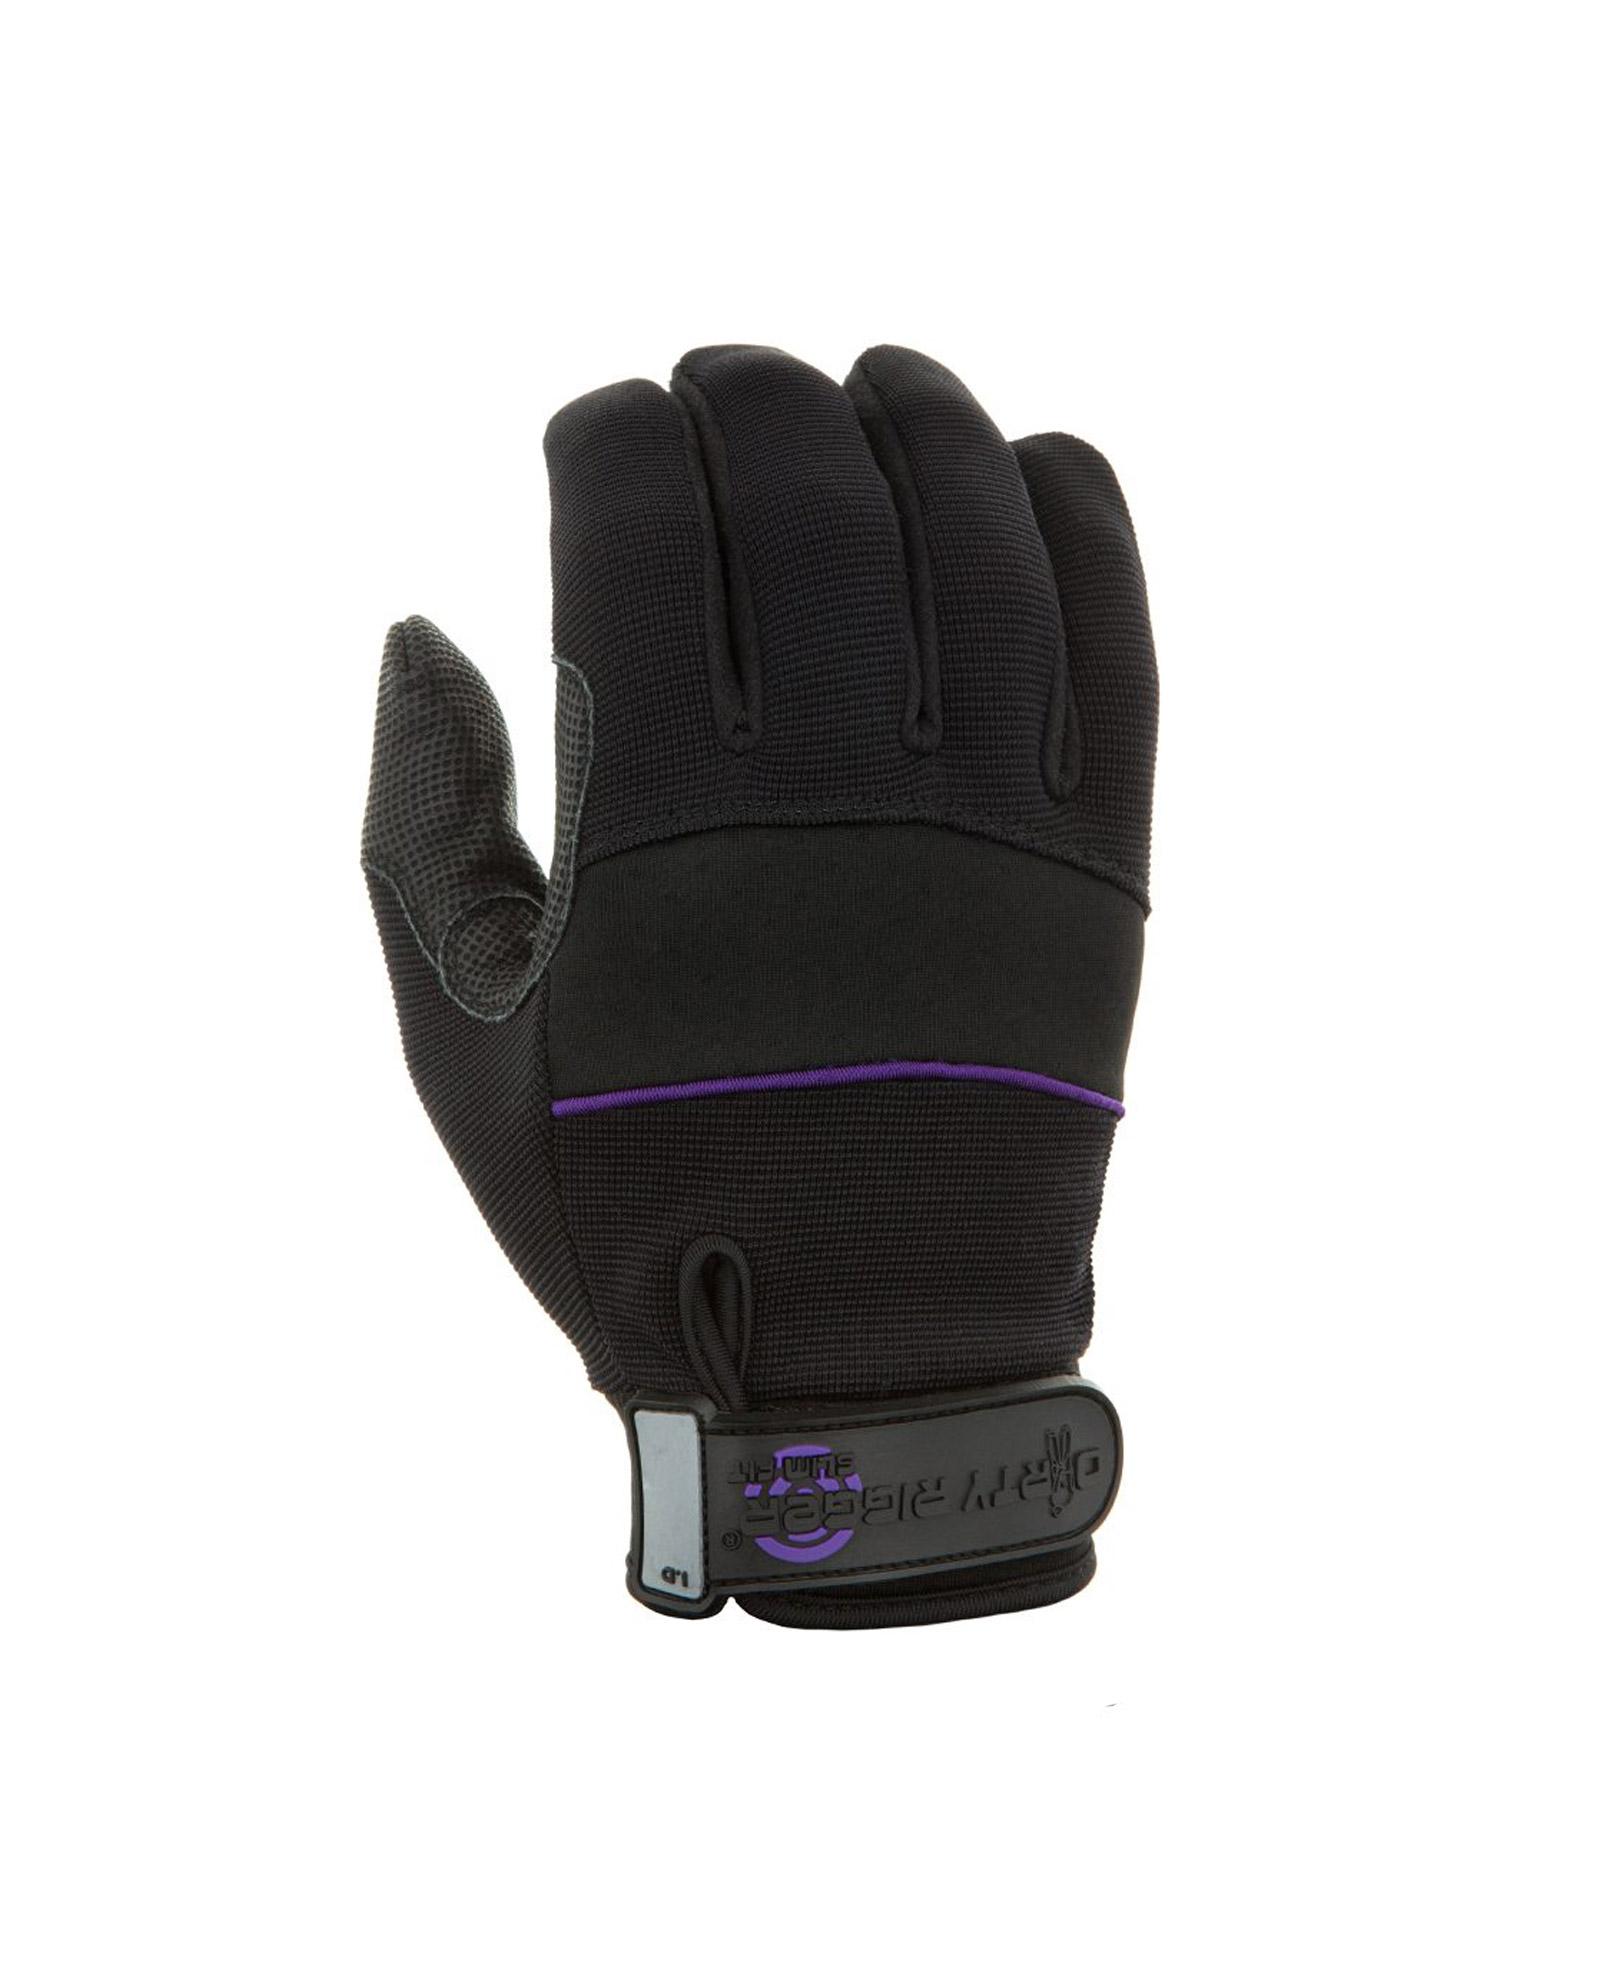 Dirty Rigger Glove Dty Slimorg Slimfit™ Rigger Glove